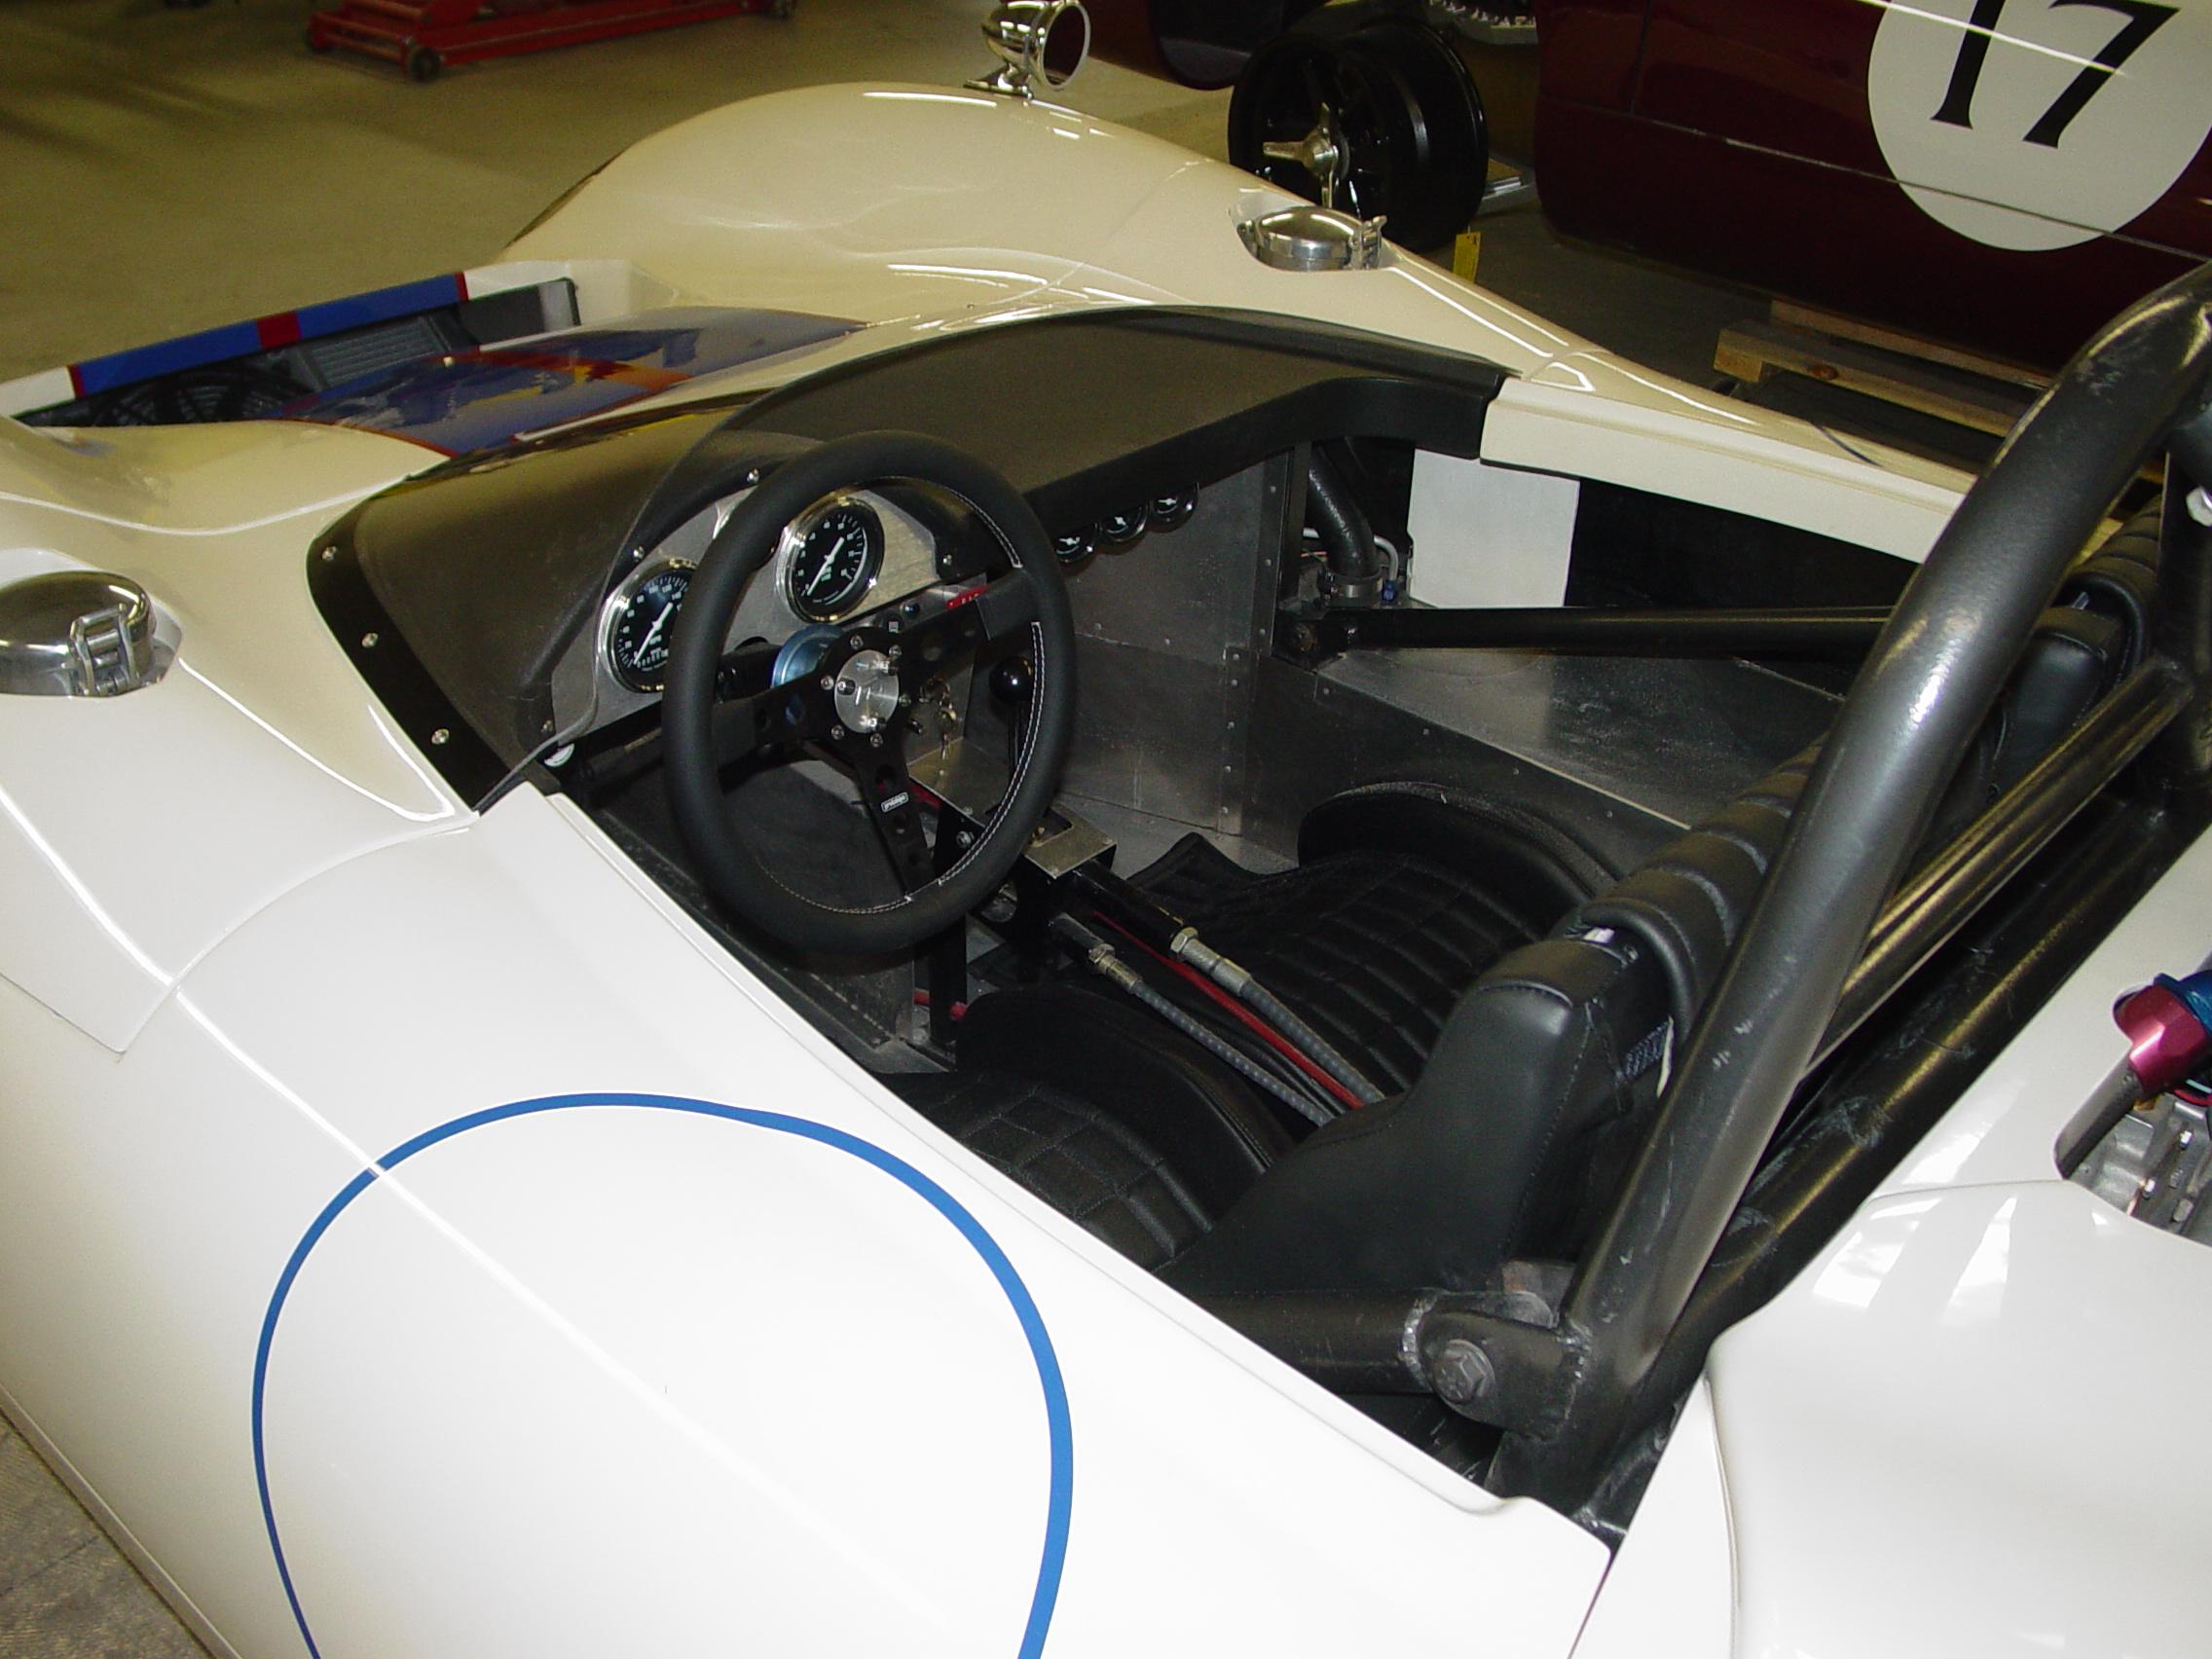 Eastons car 006.jpg